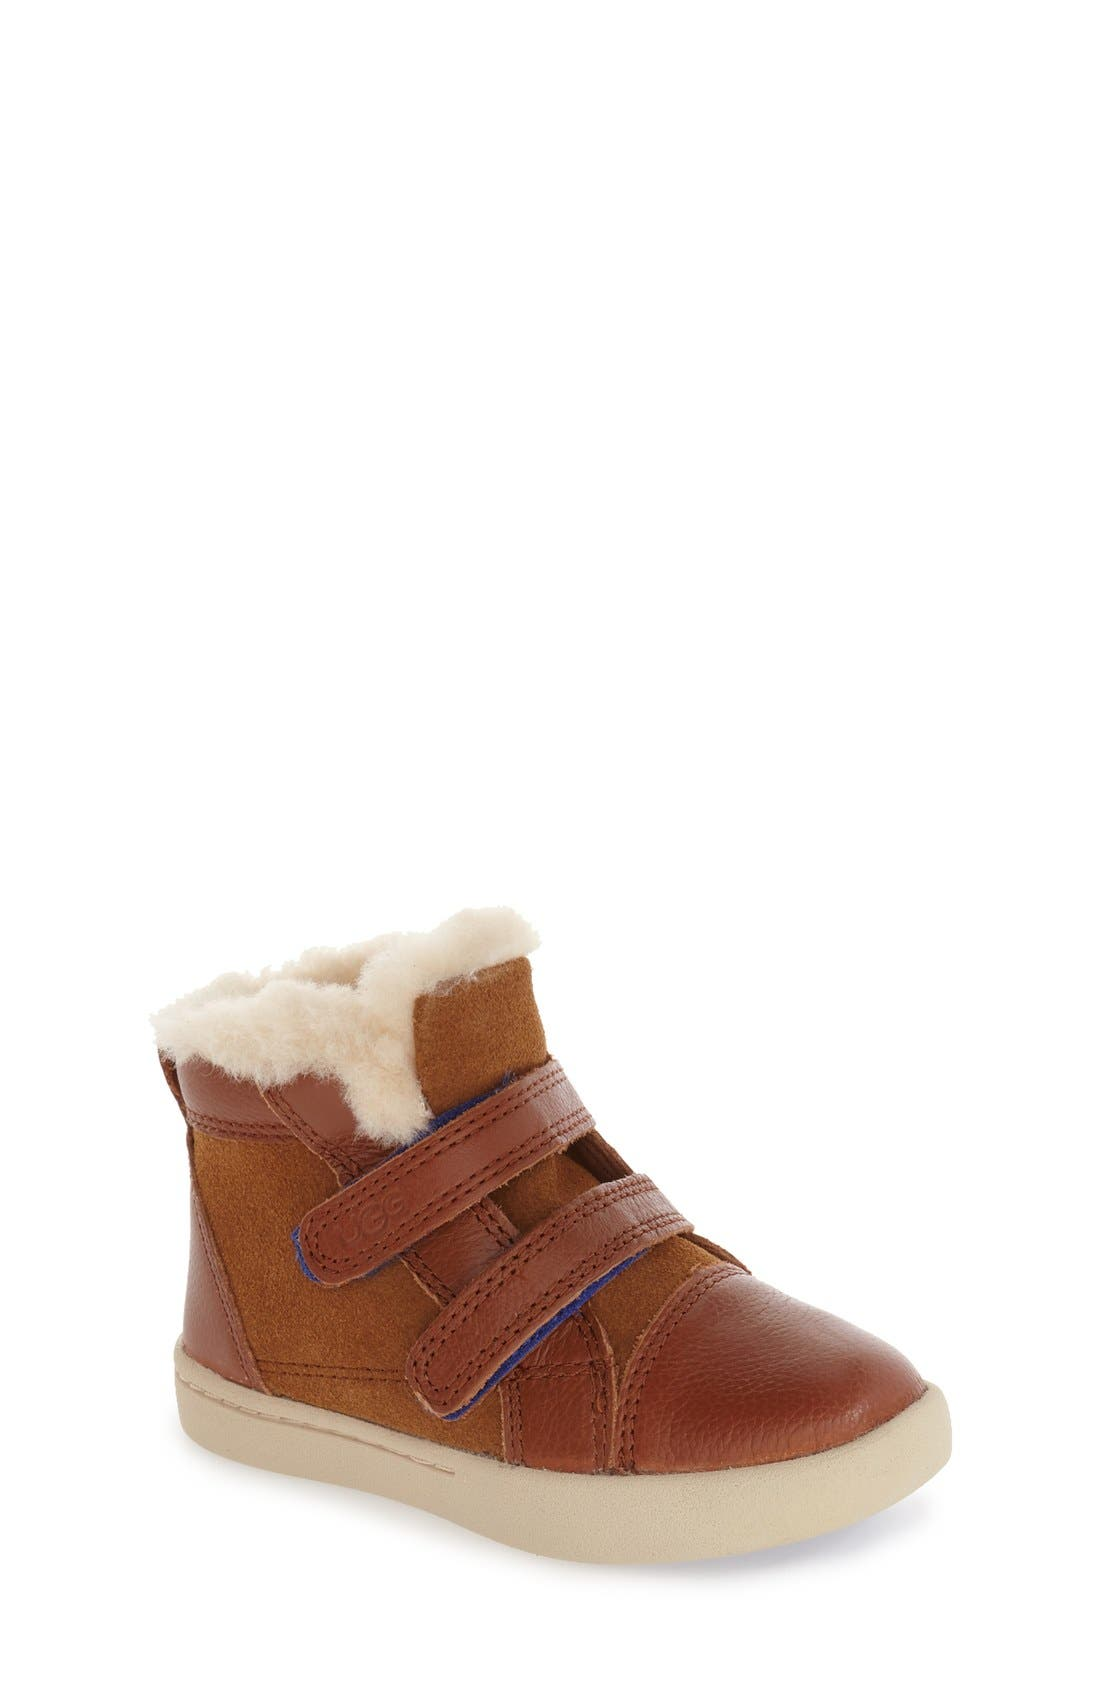 Main Image - UGG® Rennon High Top Sneaker (Walker & Toddler)